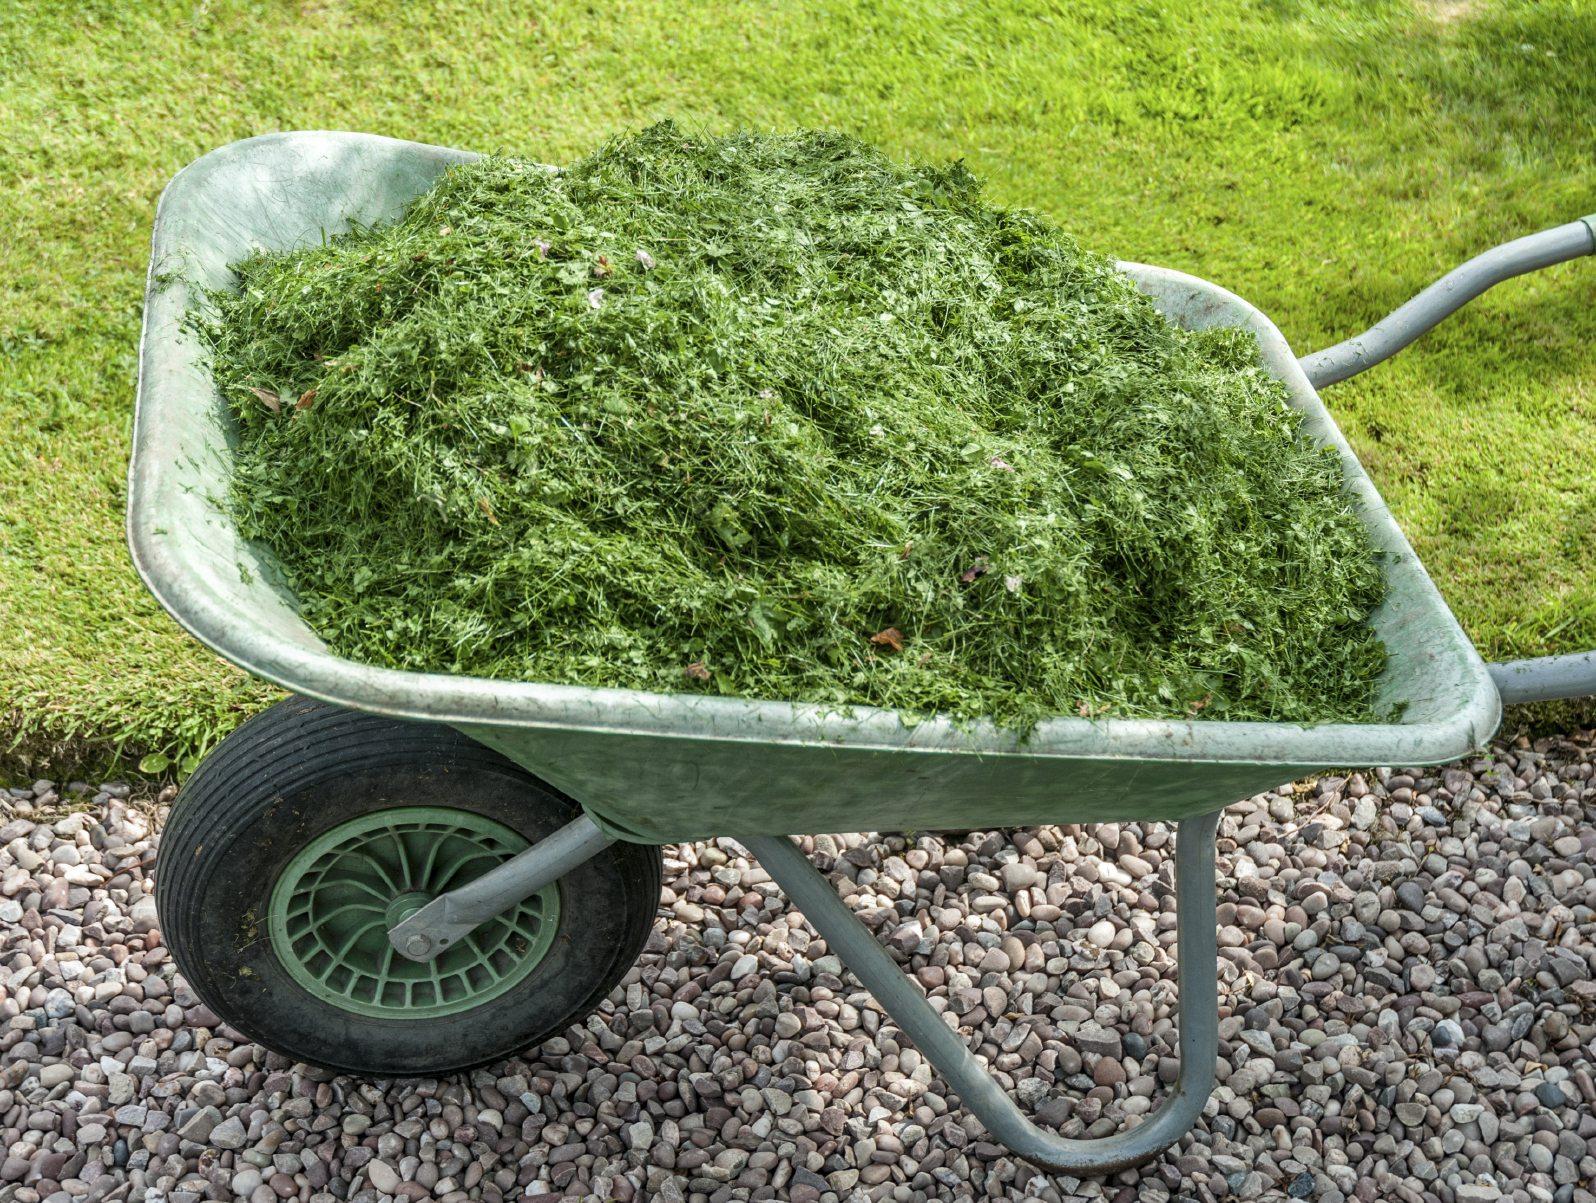 grass-mulch-jpg.jpg